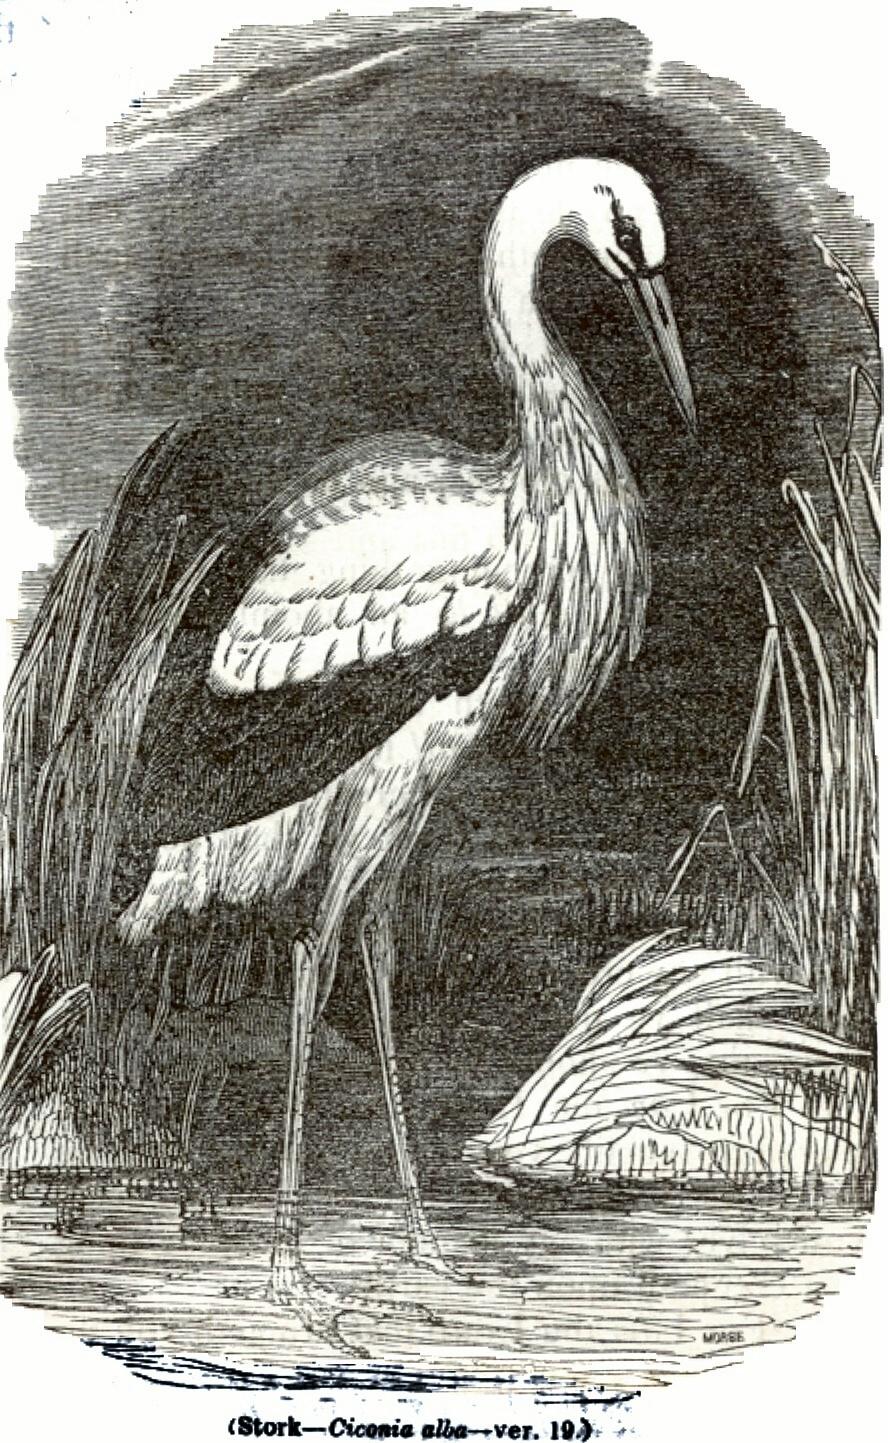 Stork - Ciconia alba